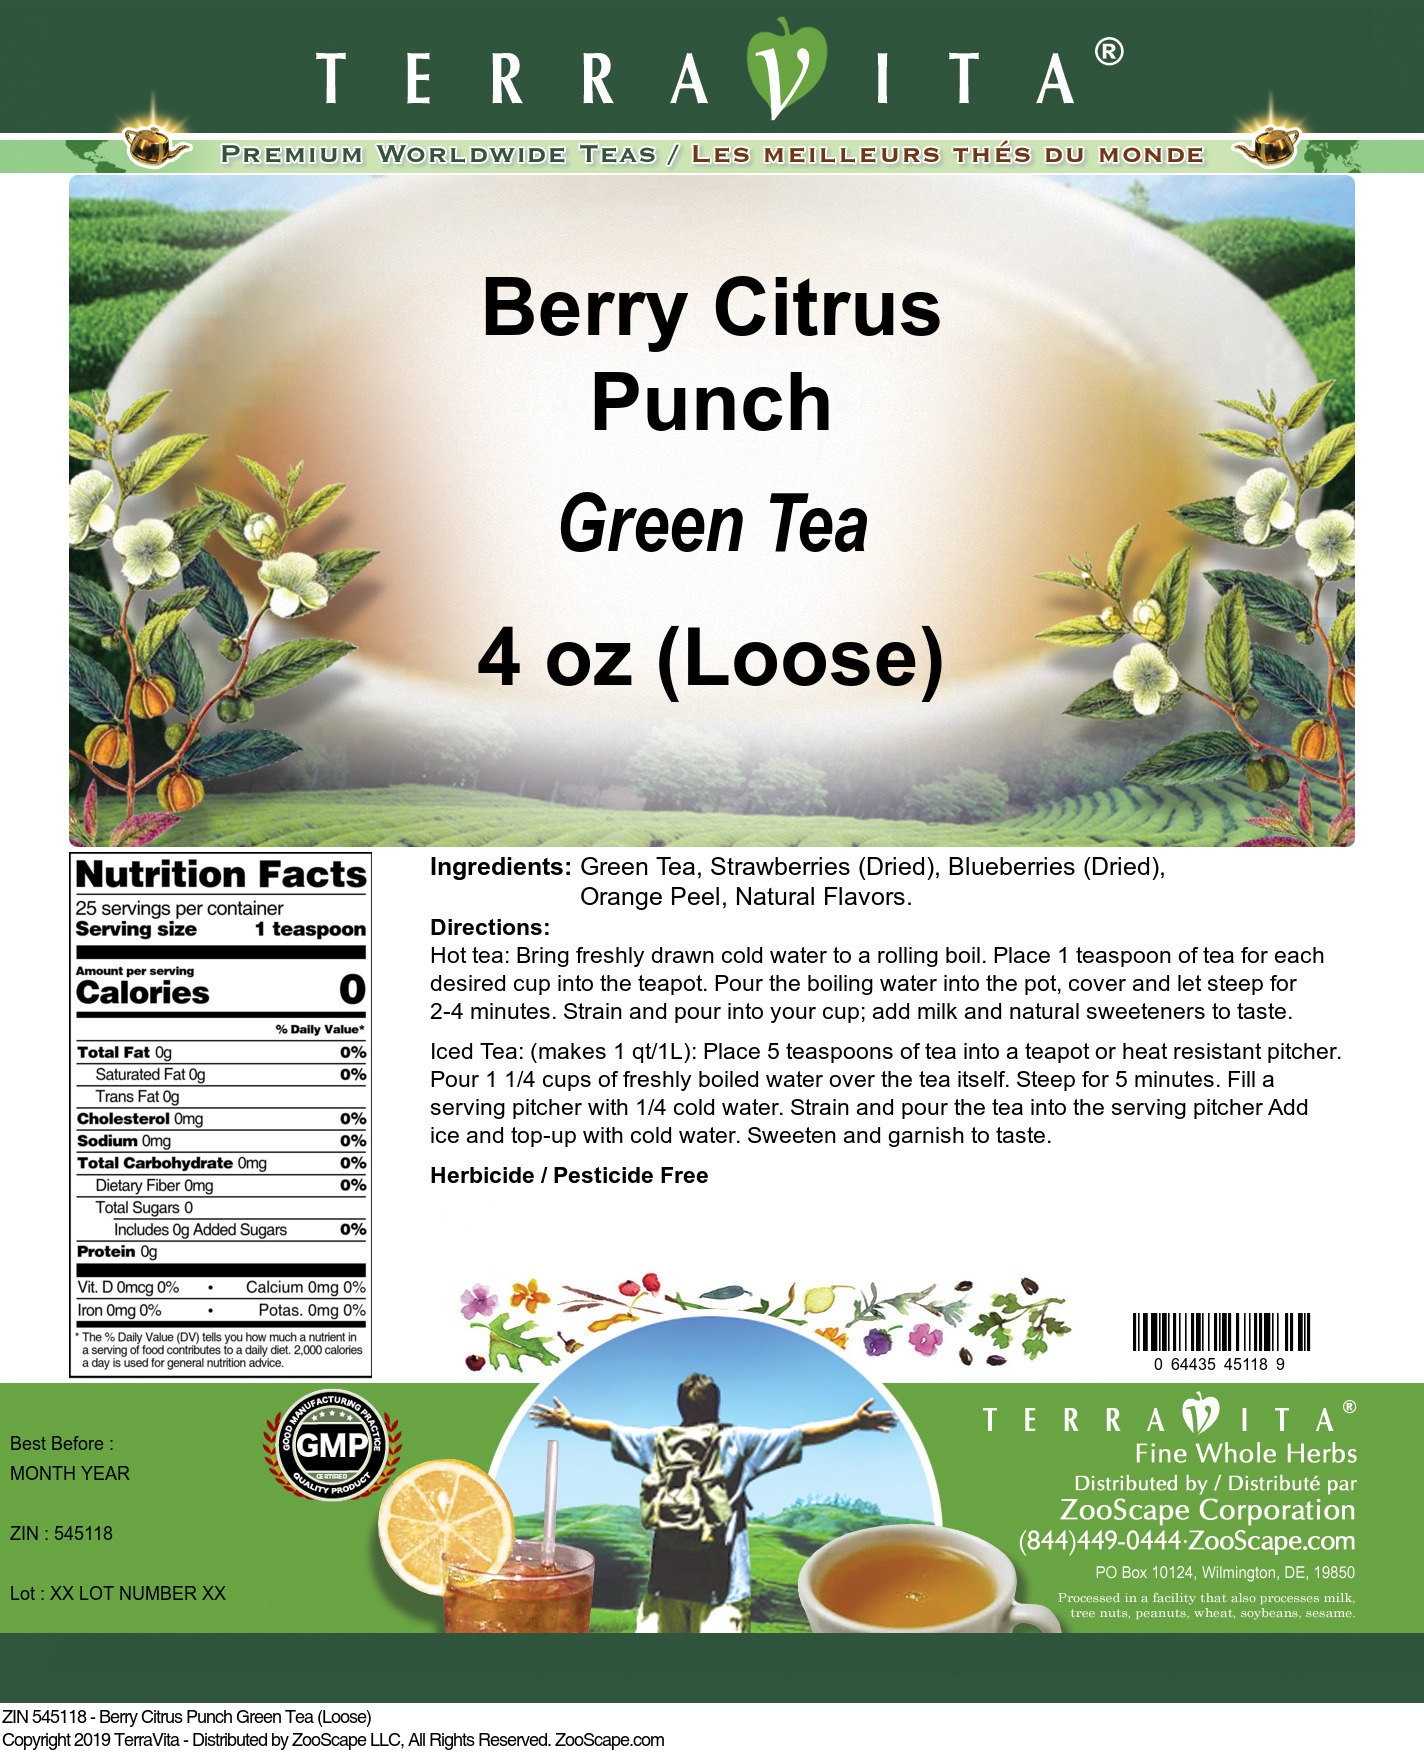 Berry Citrus Punch Green Tea